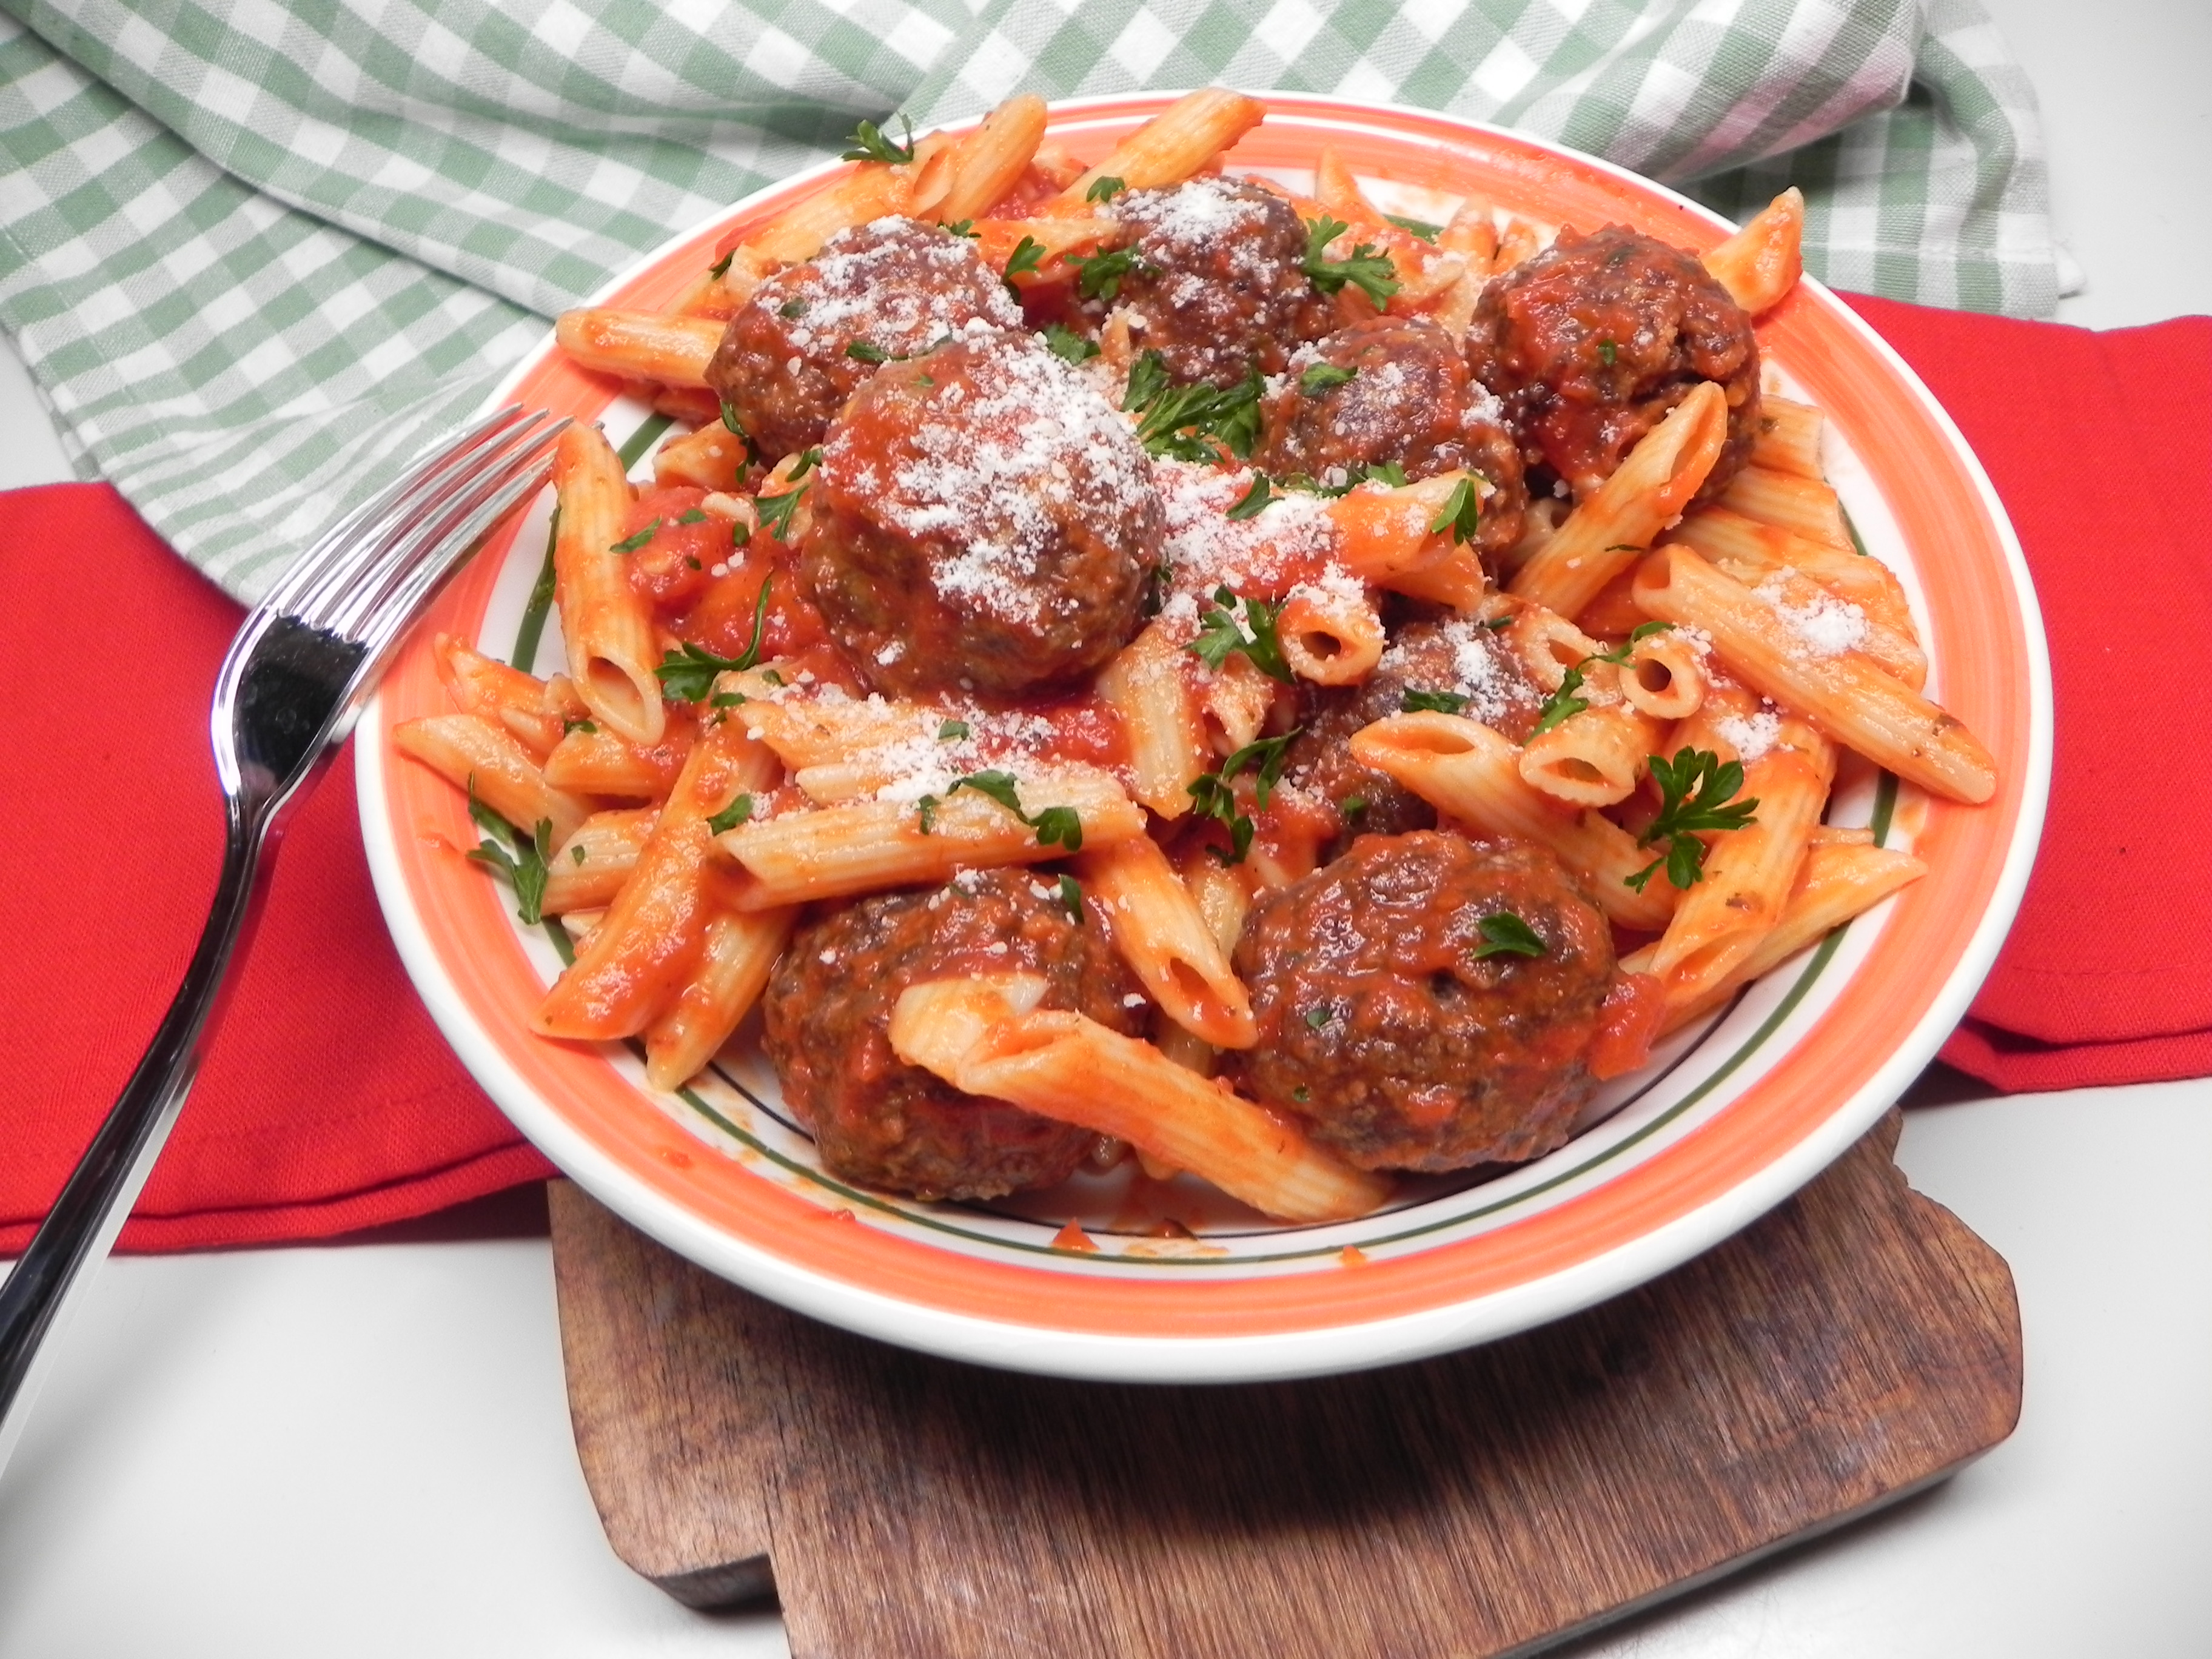 Spicy Venison Meatballs